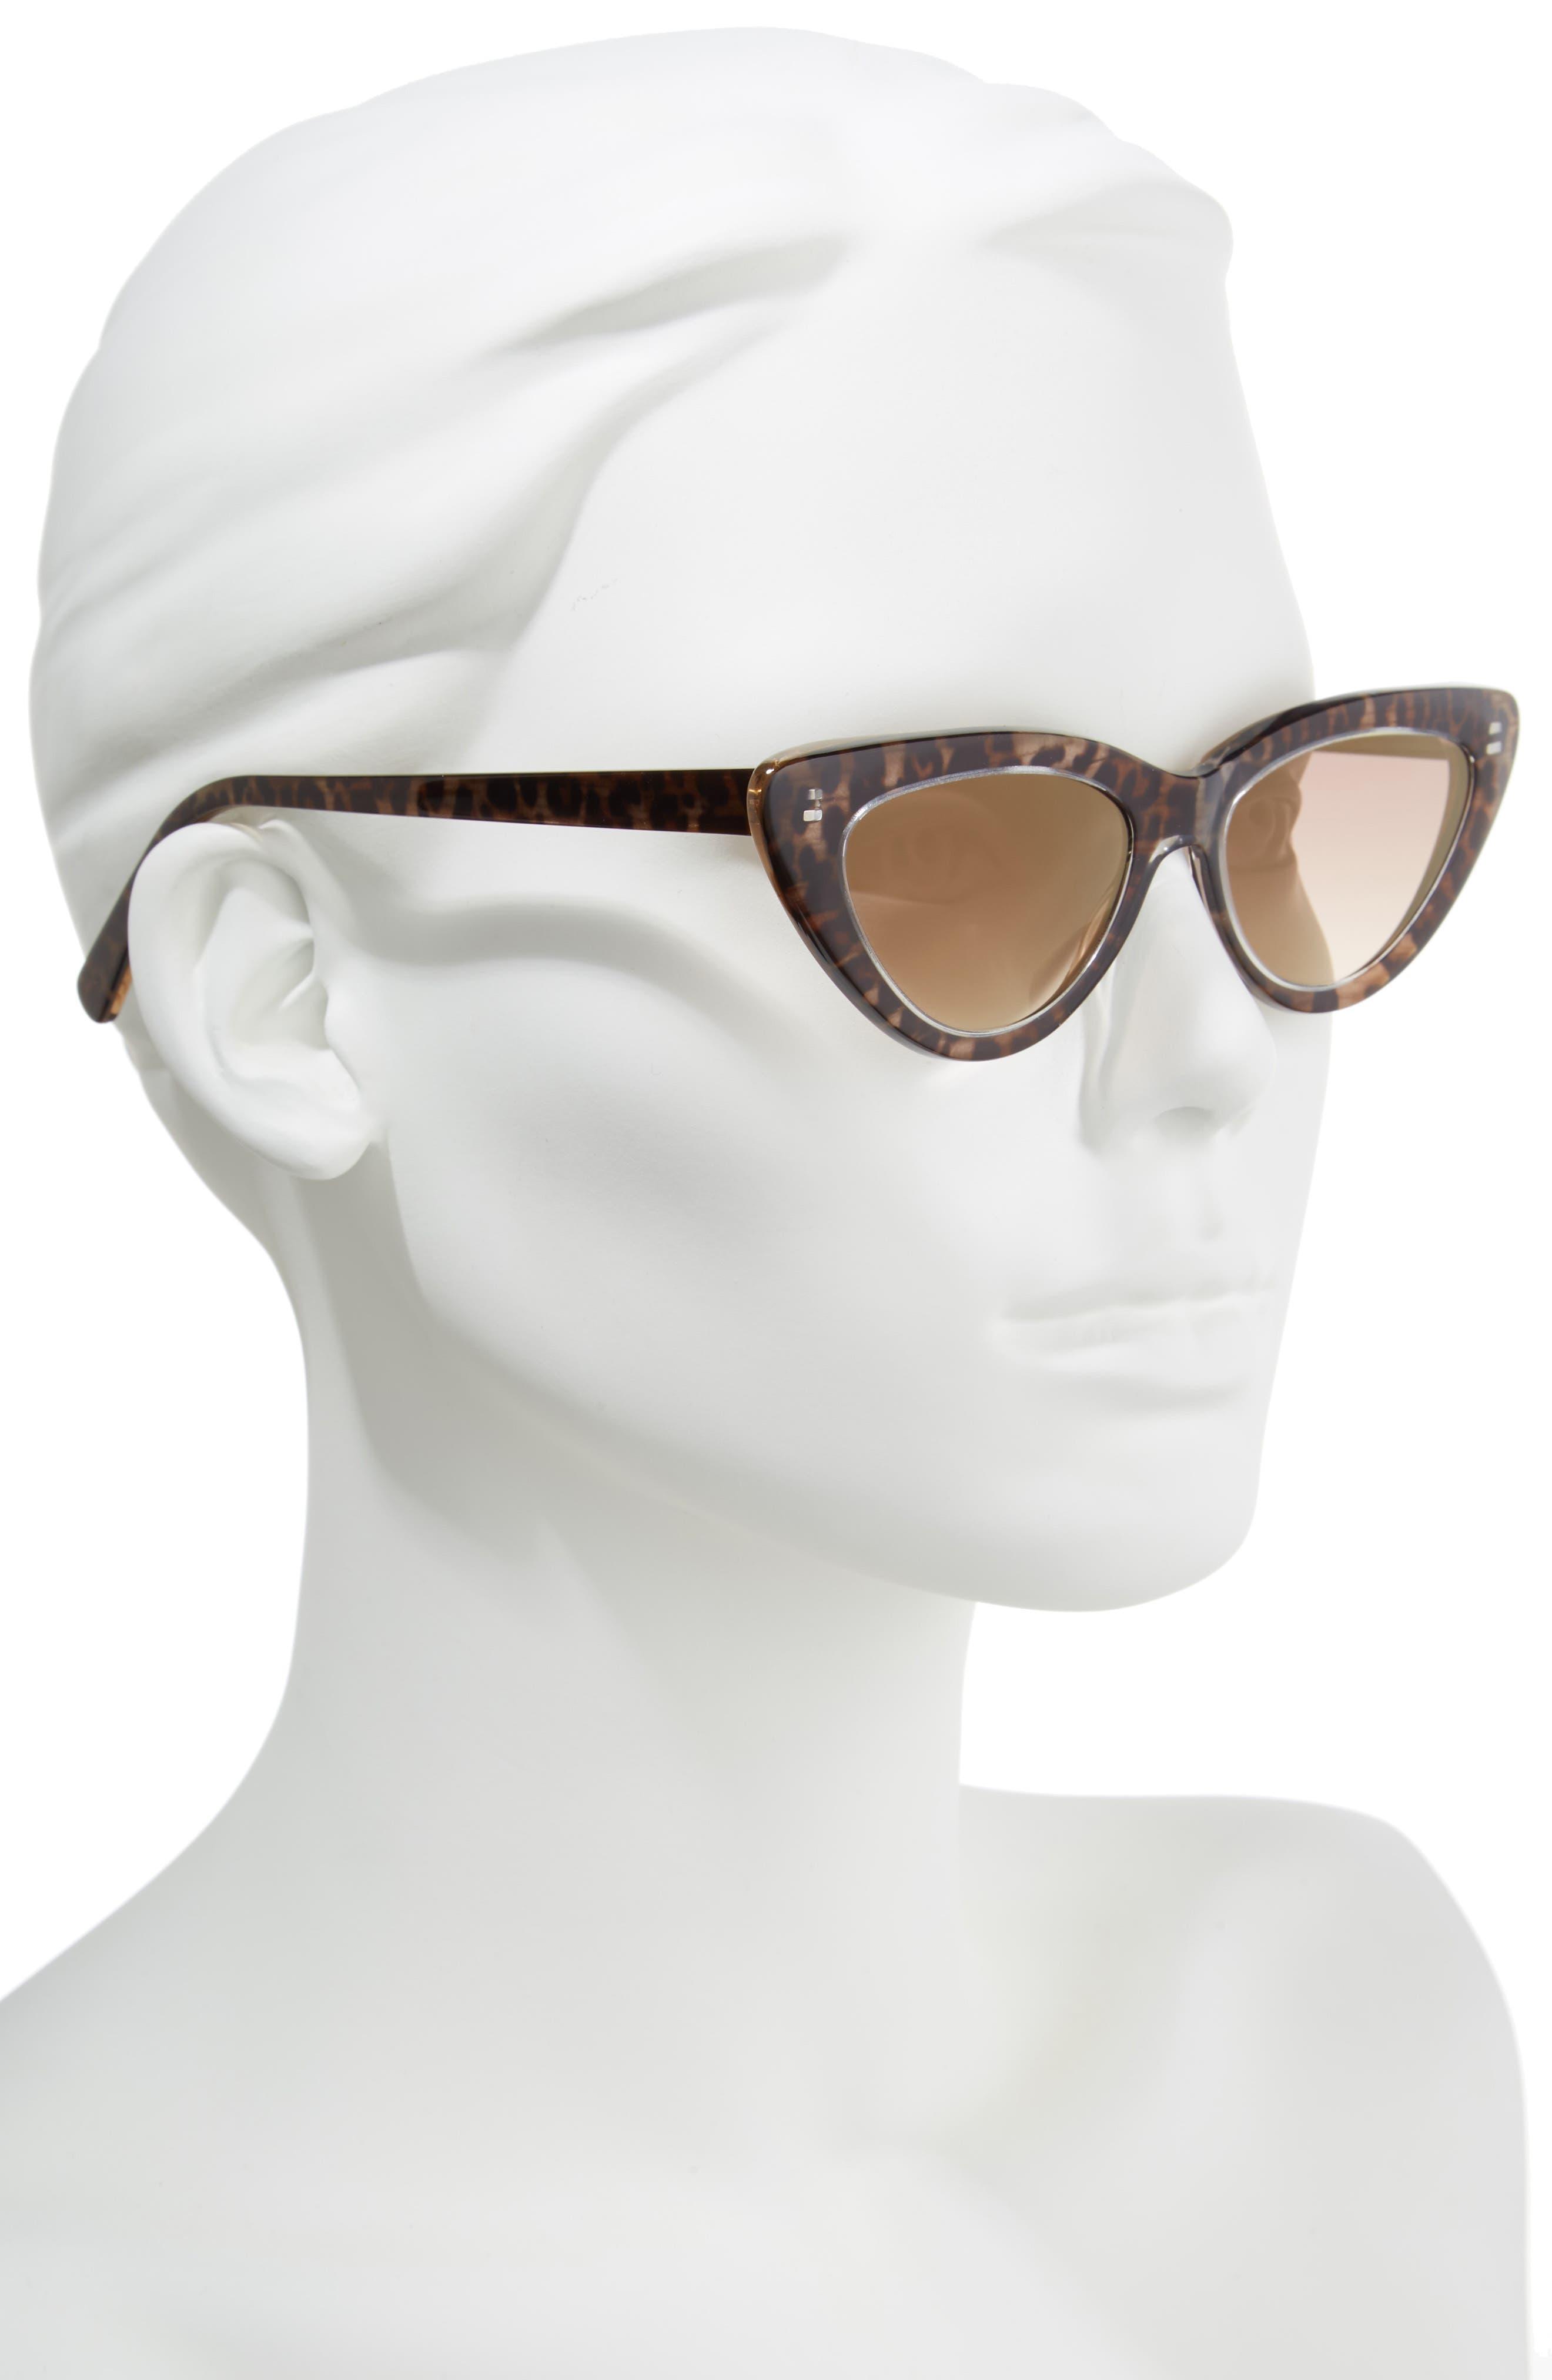 D'BLANC A-Muse 52mm Sunglasses,                             Alternate thumbnail 2, color,                             Cheetah